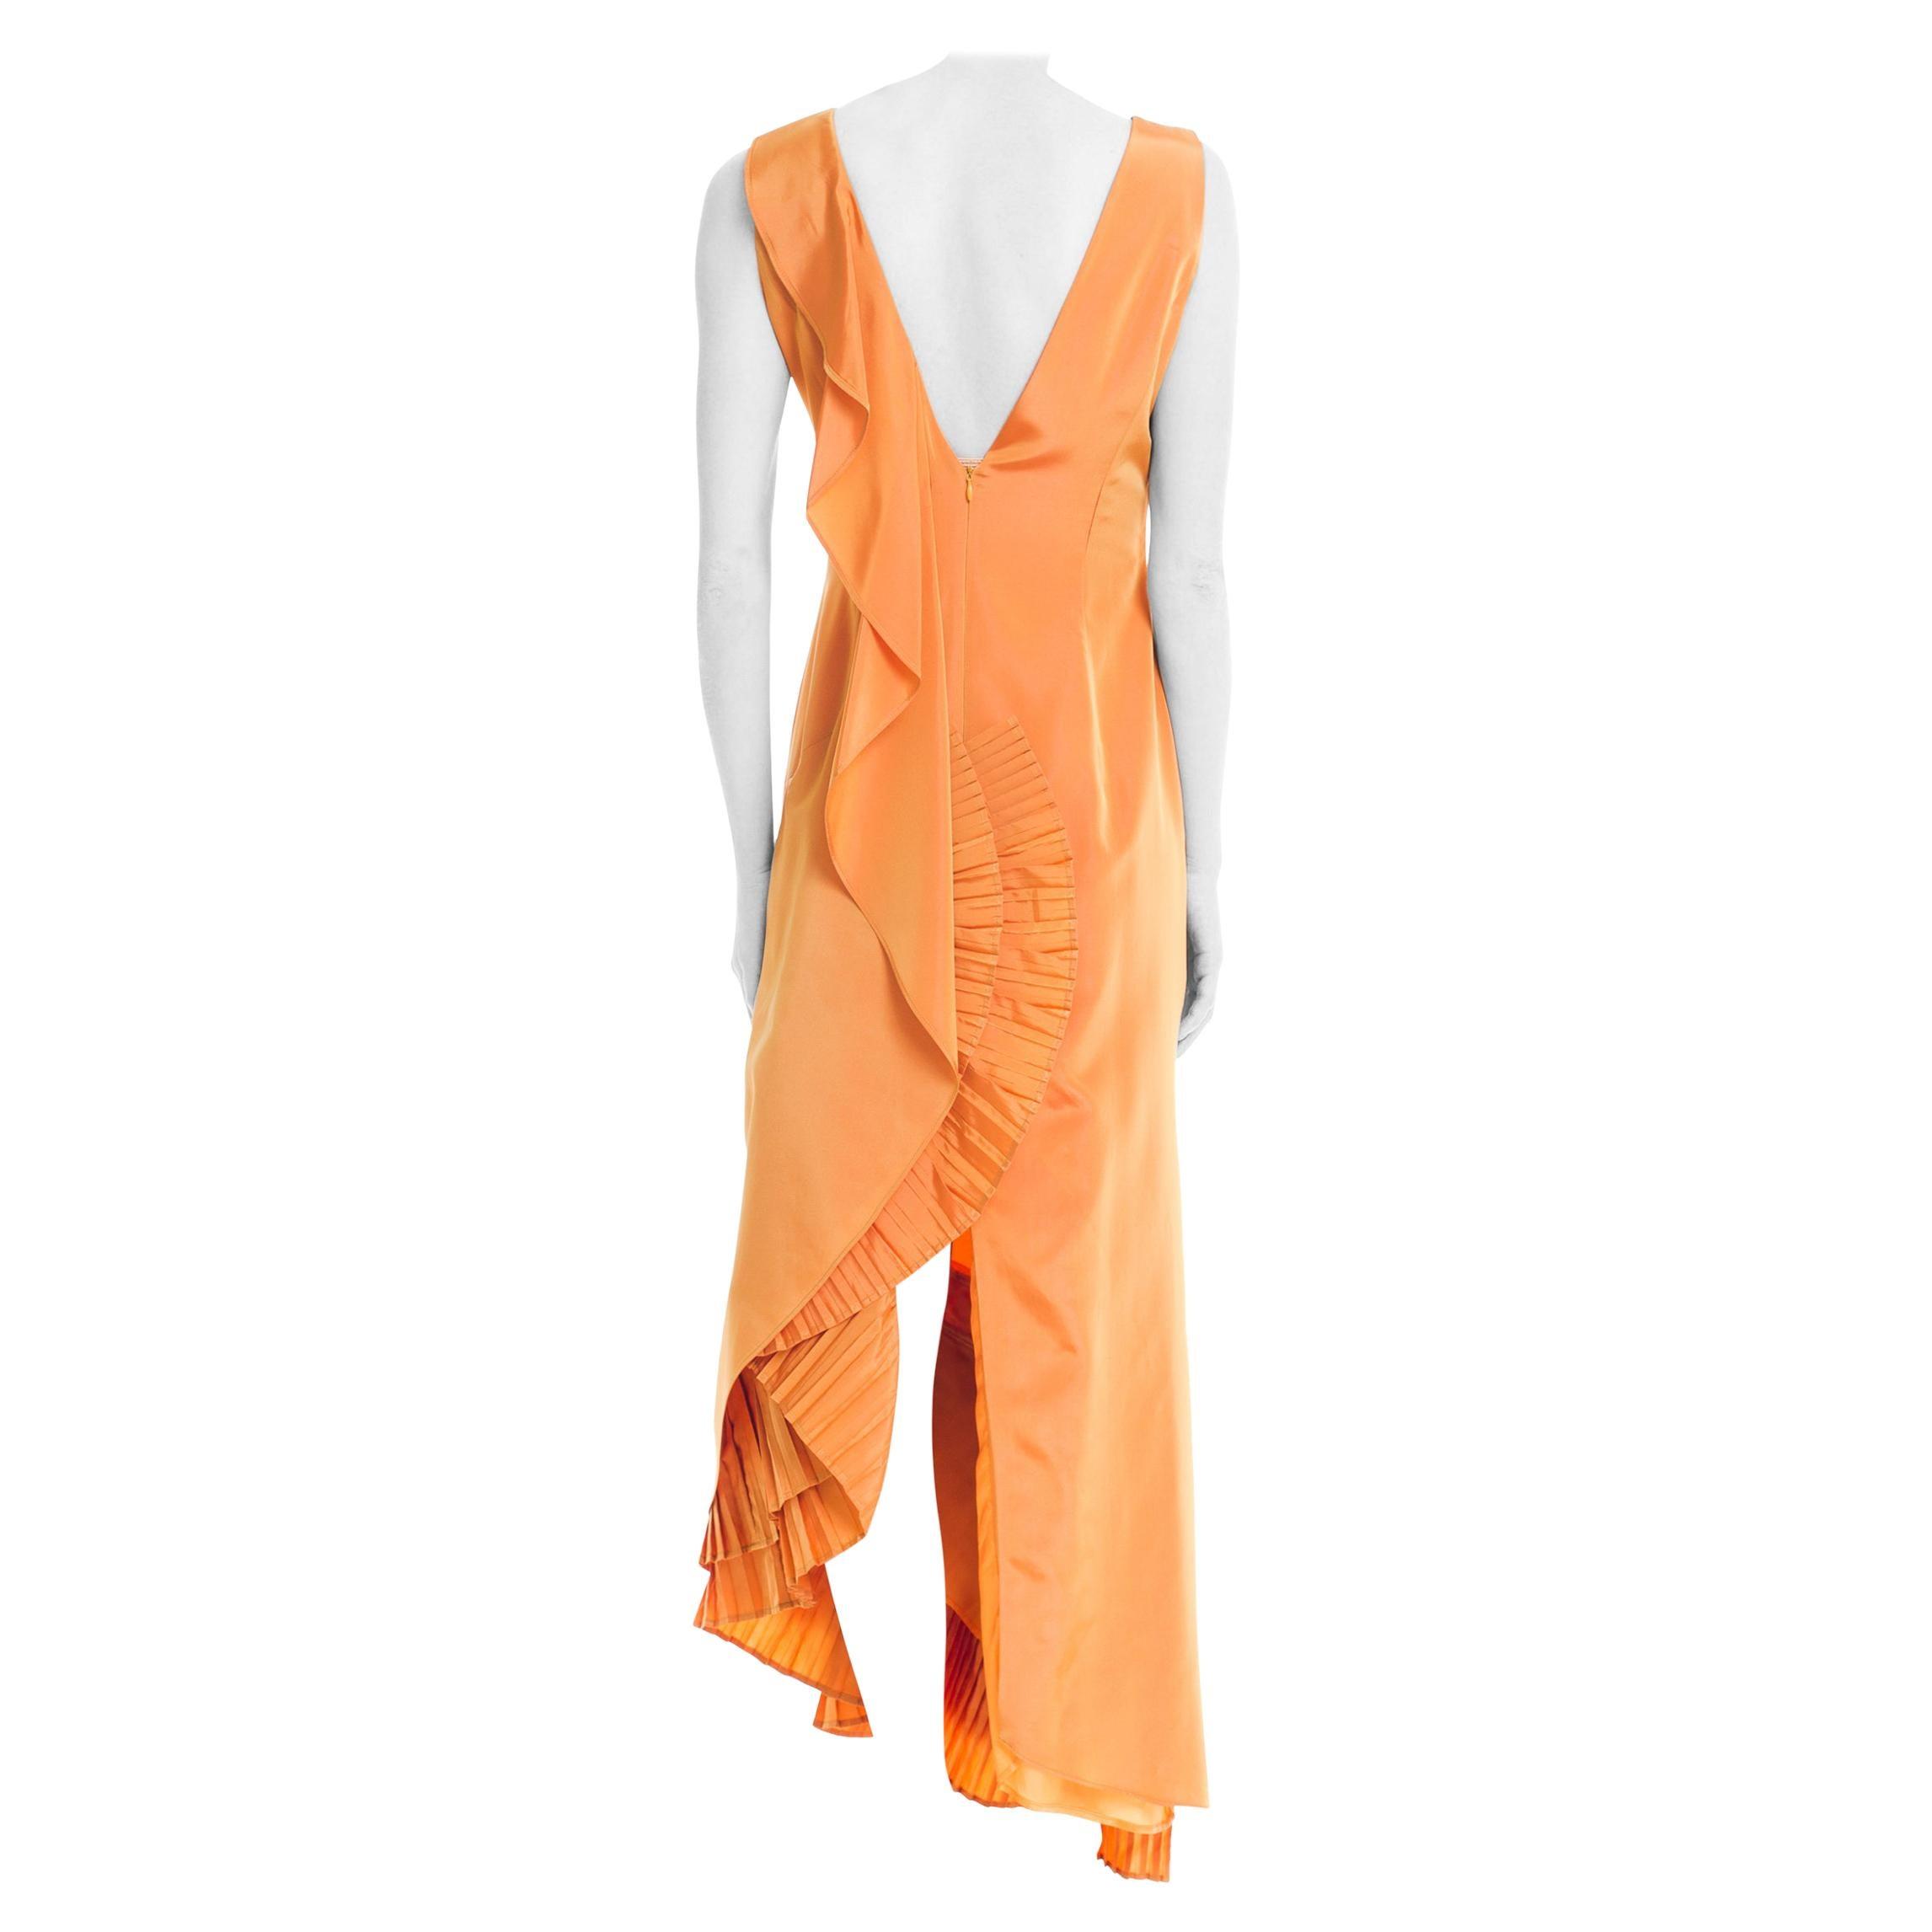 1990S GIANFRANCO FERRE Light Orange Irridescent Acetate Taffeta Gown With Drama